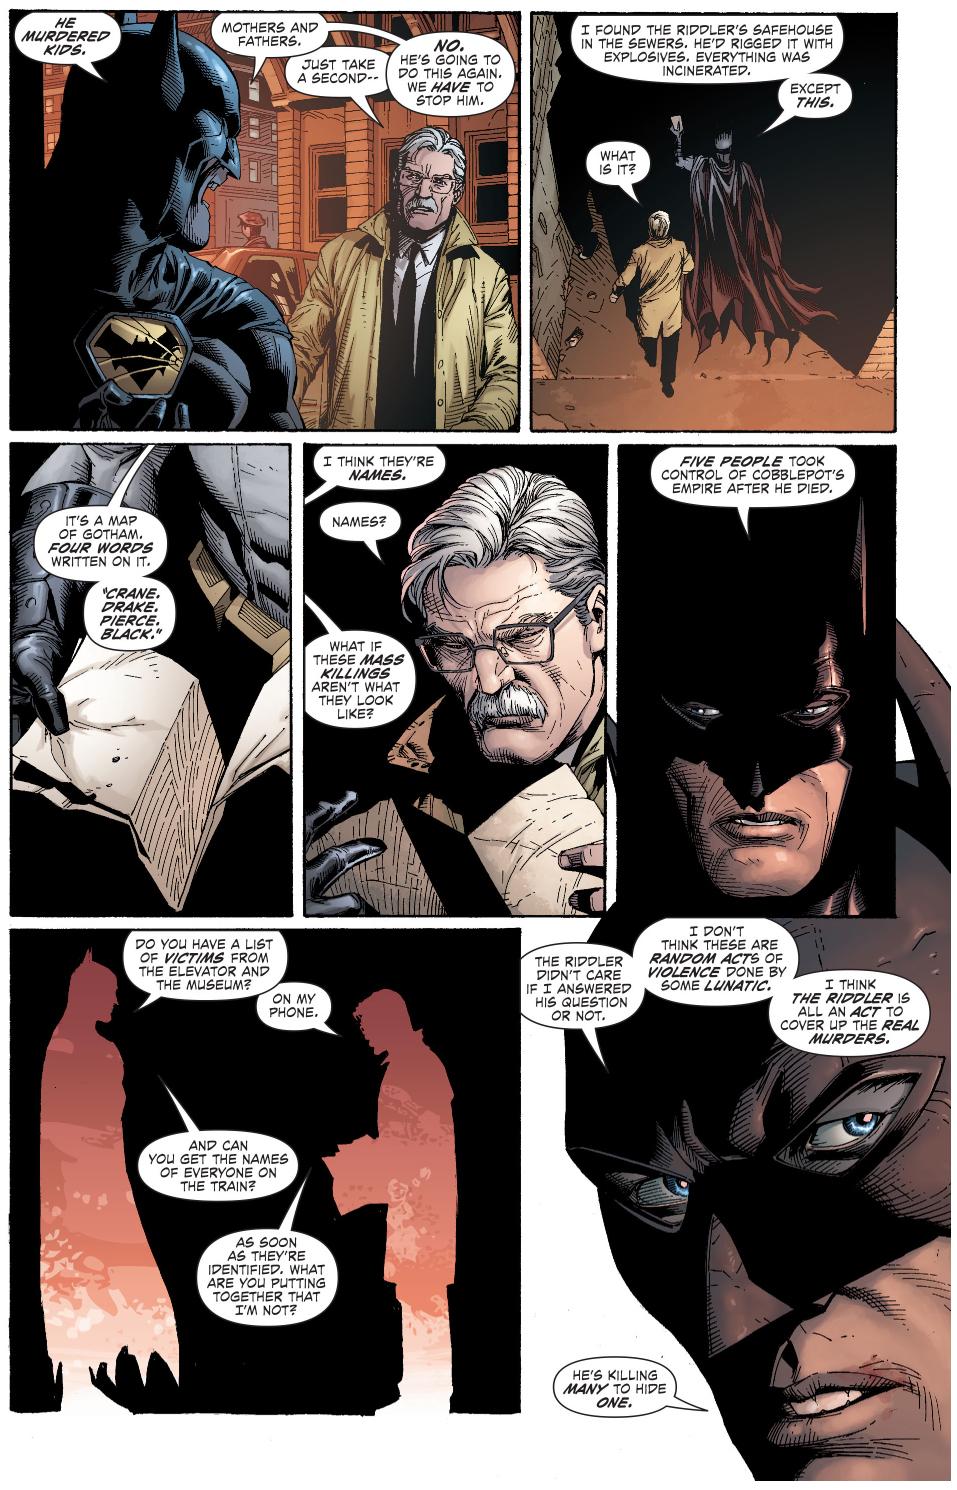 jim gordon impressed with batman's detective skills